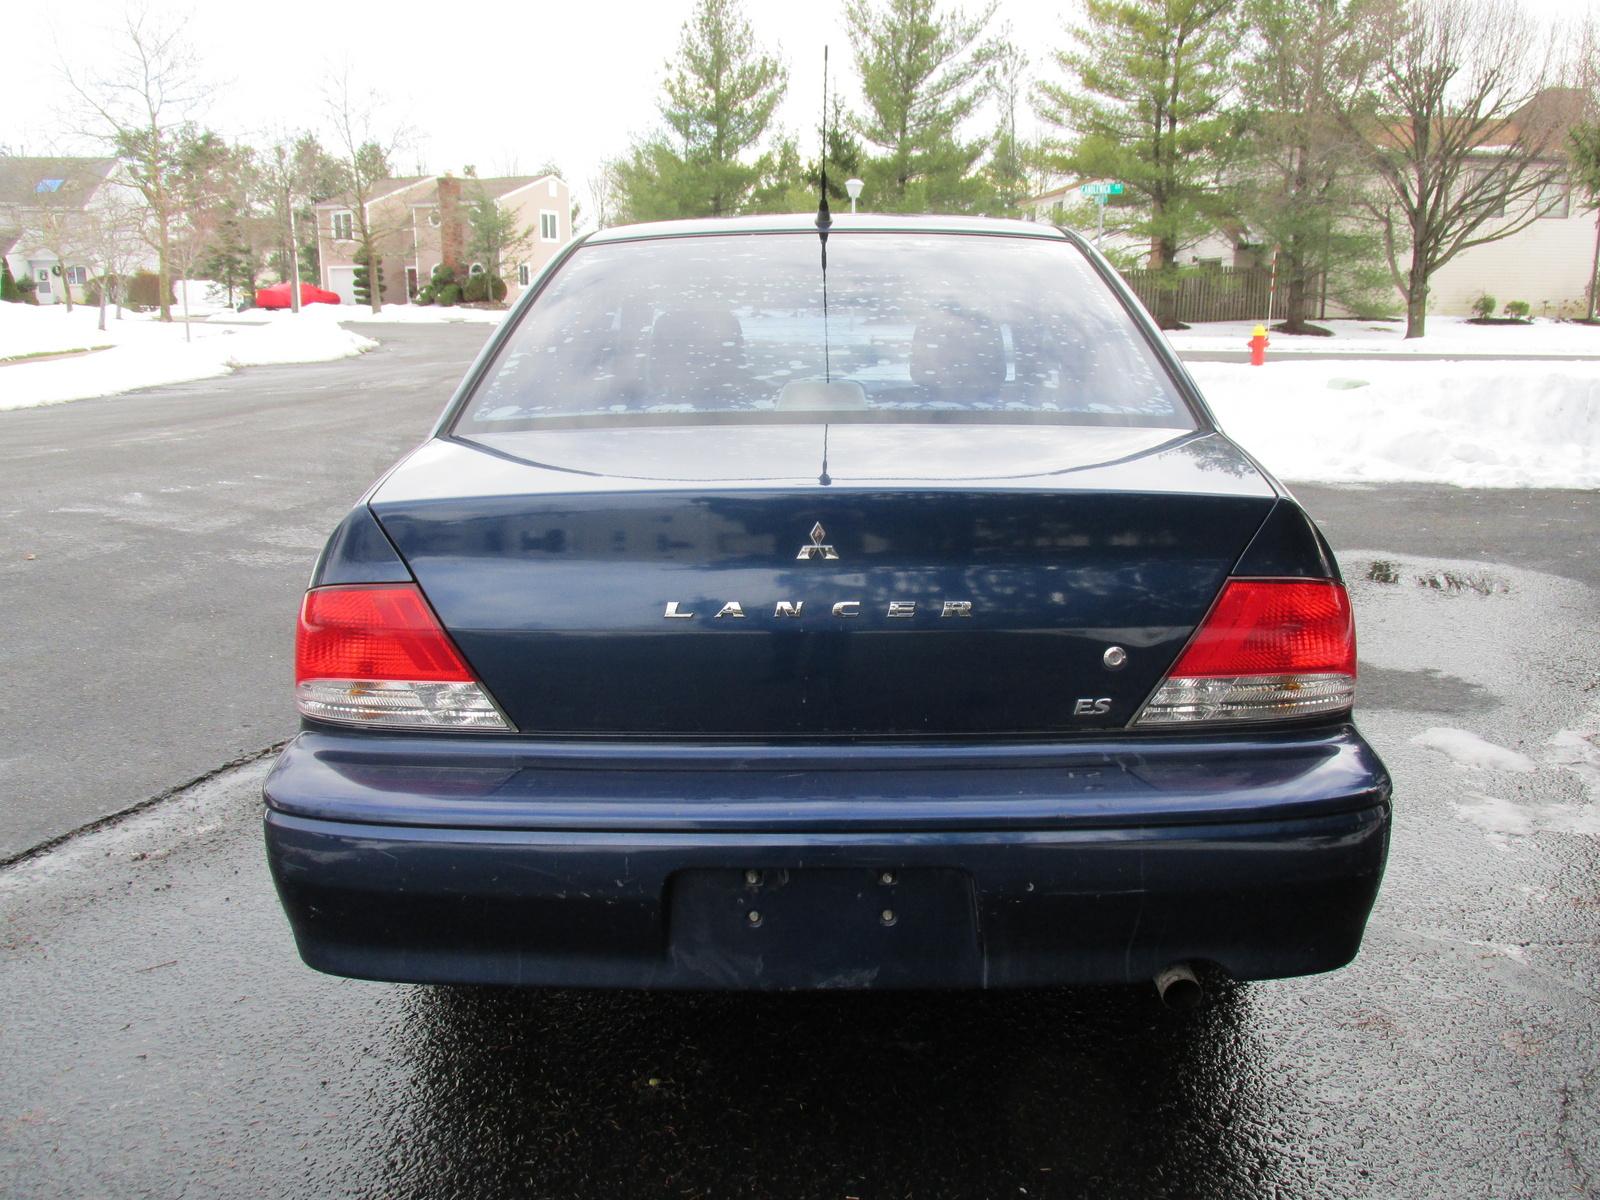 2002 Mitsubishi Lancer Pictures Cargurus